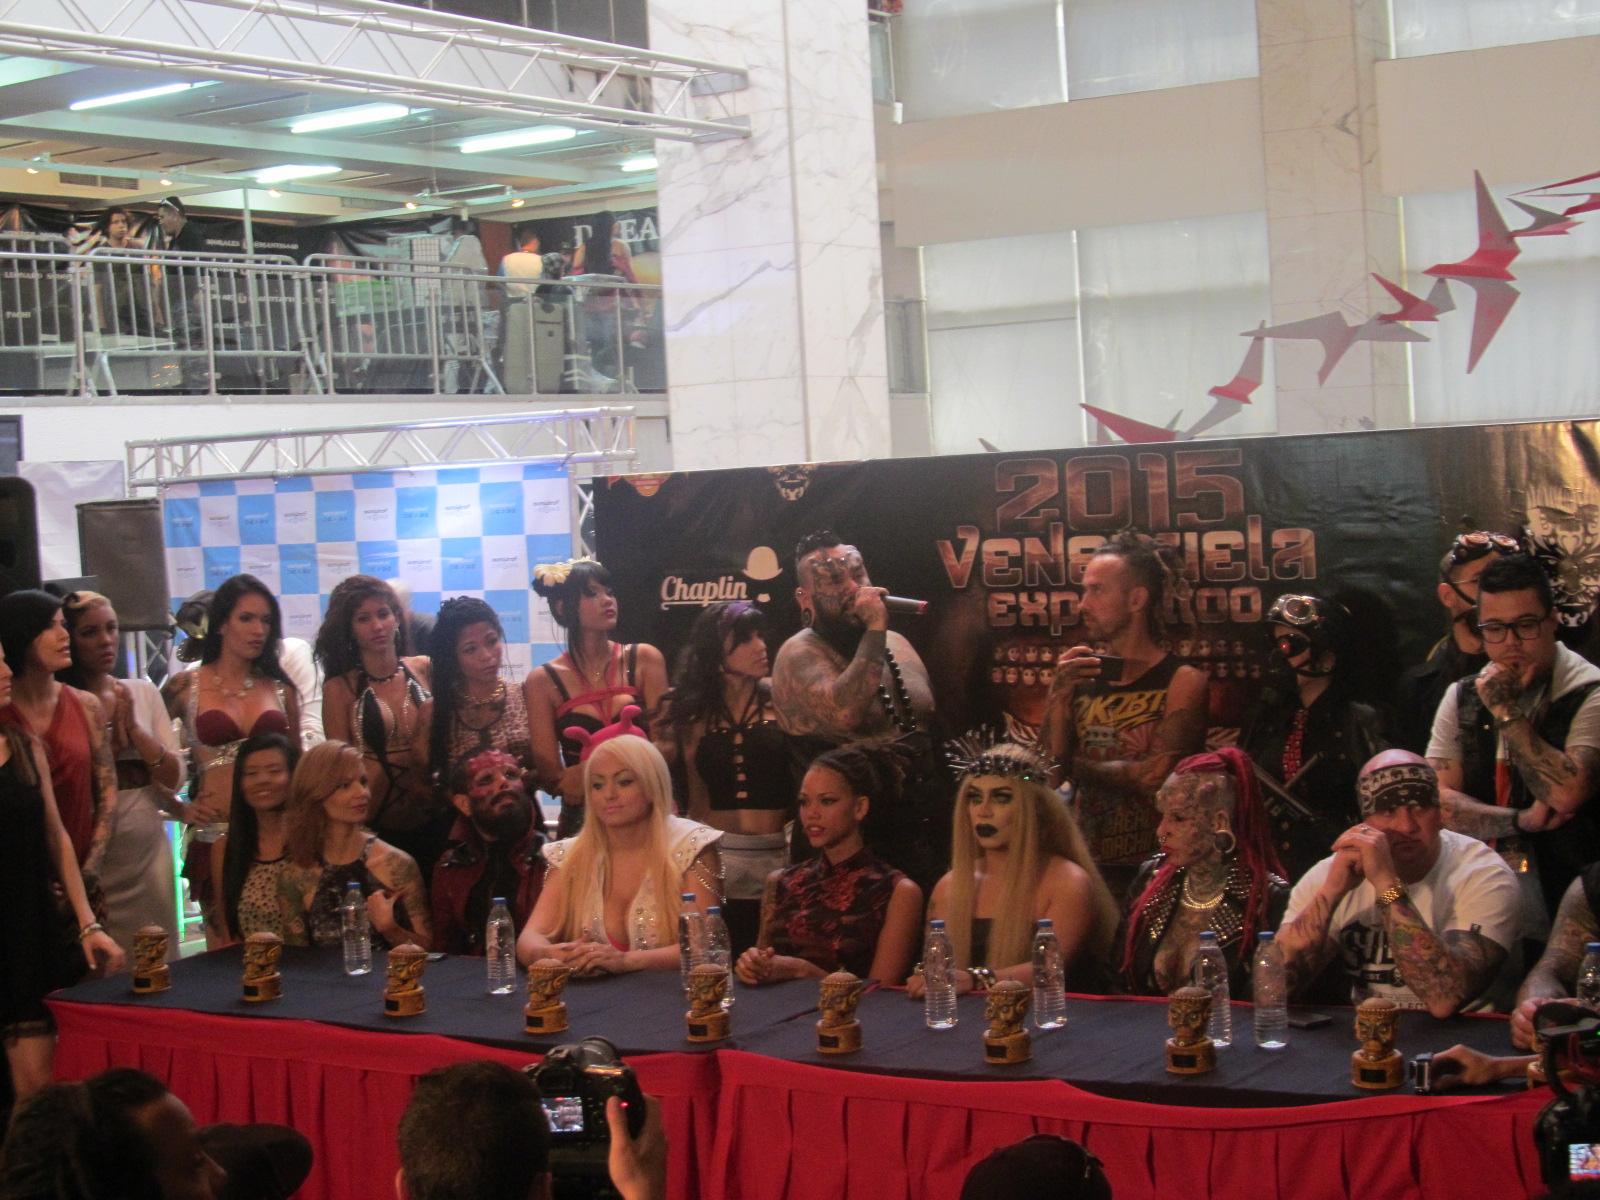 Ya arrancó la Expo Tattoo Venezuela 2015